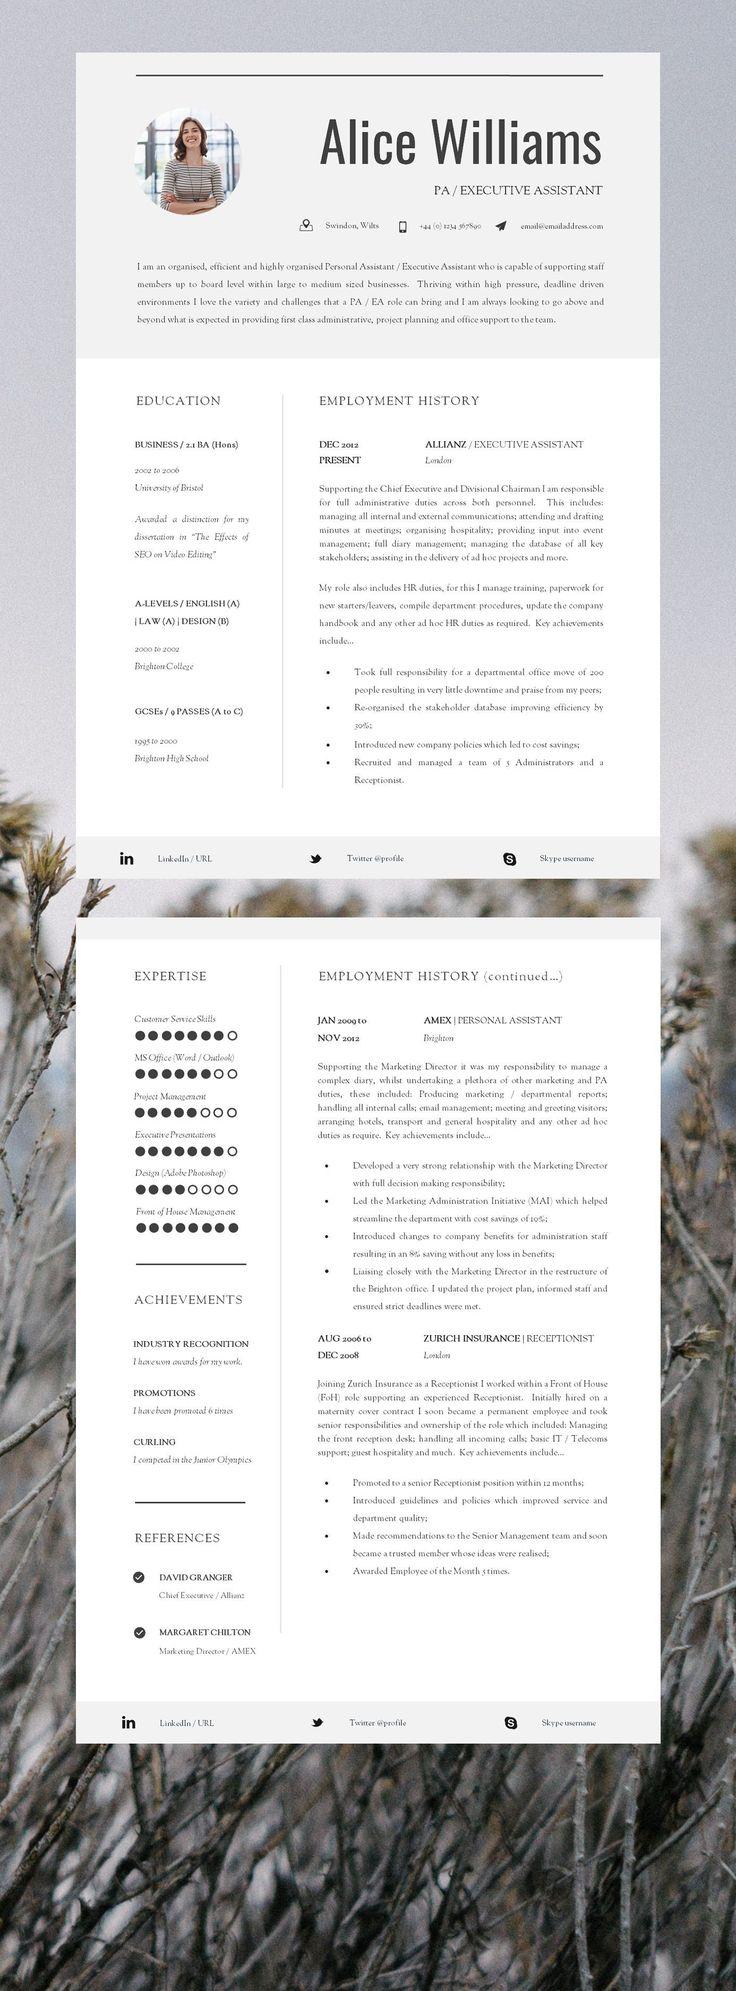 Medical Sales Resume Sample Template%0A Resume Template   Creative Resume Template   Two Page Professional Resume u